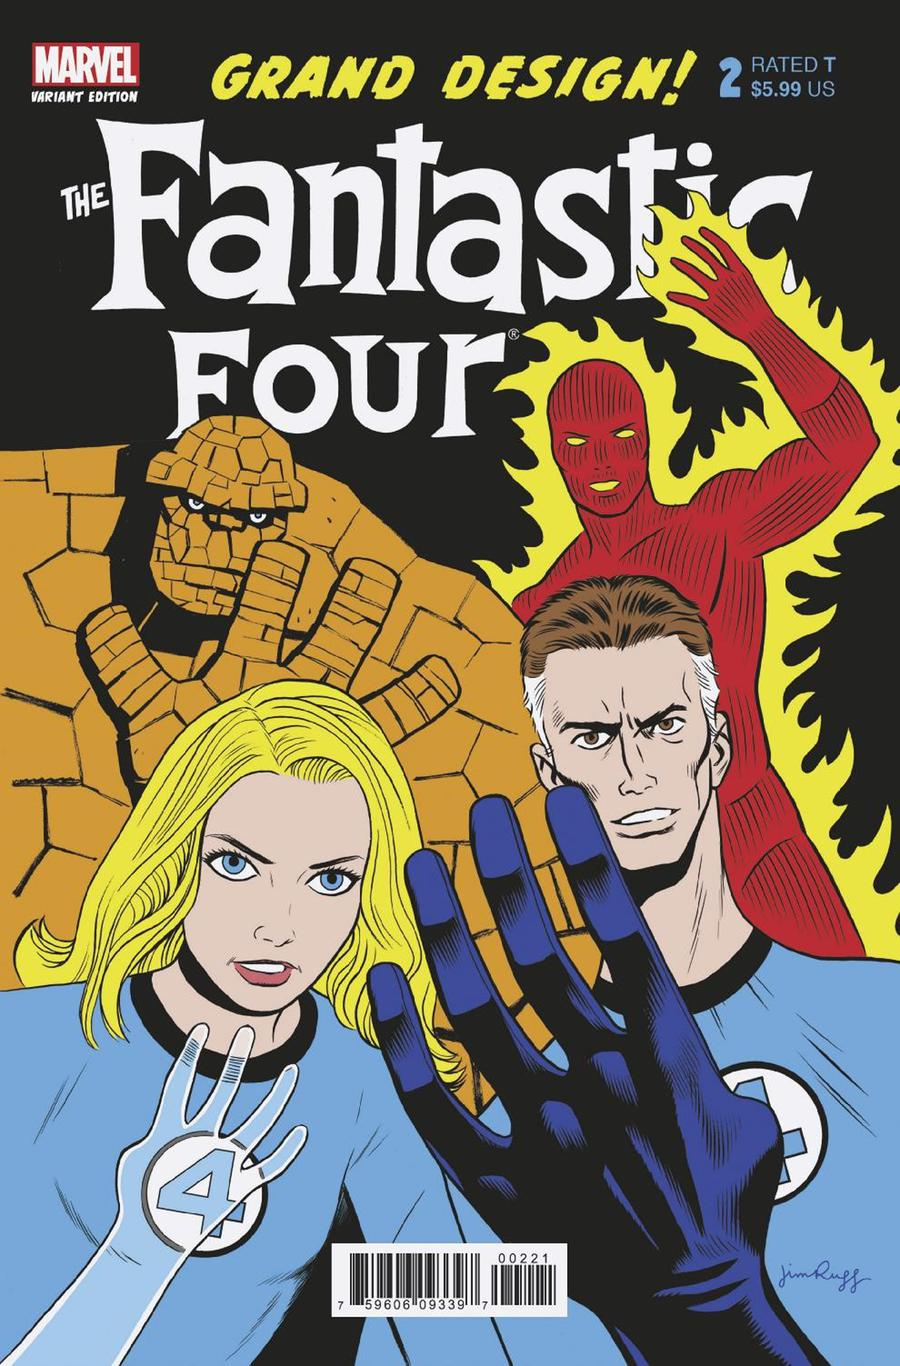 Fantastic Four Grand Design #2 Cover B Variant Jim Rugg Cover